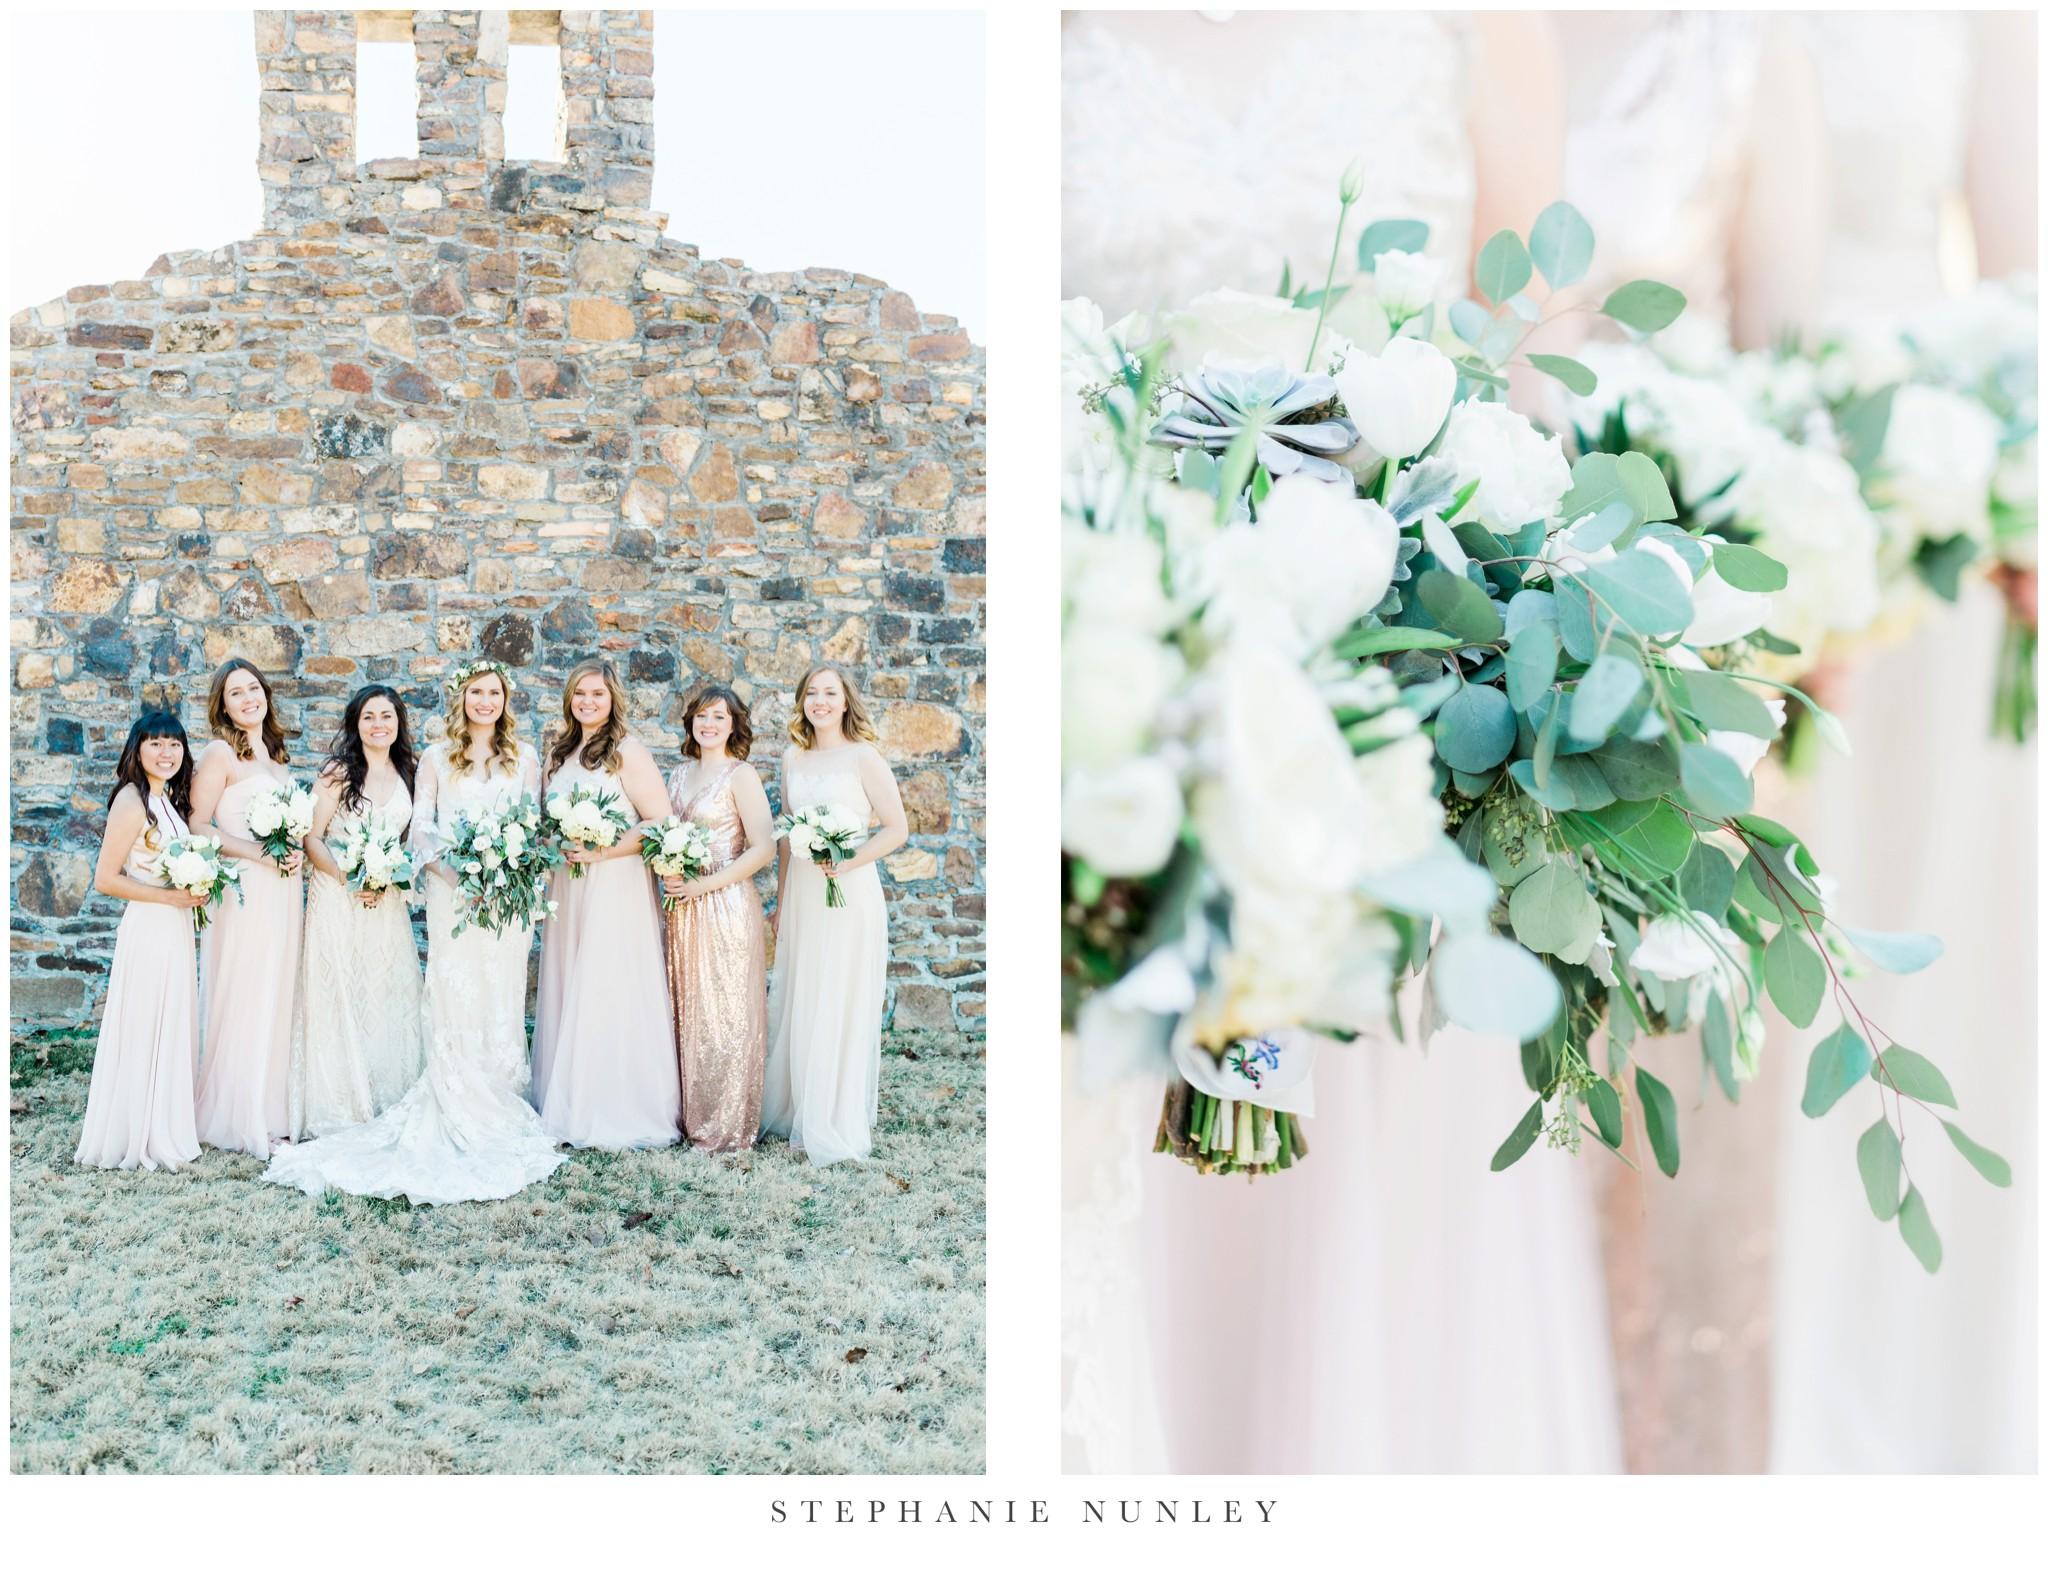 sassafrass-springs-vineyard-film-wedding-photos-48.jpg